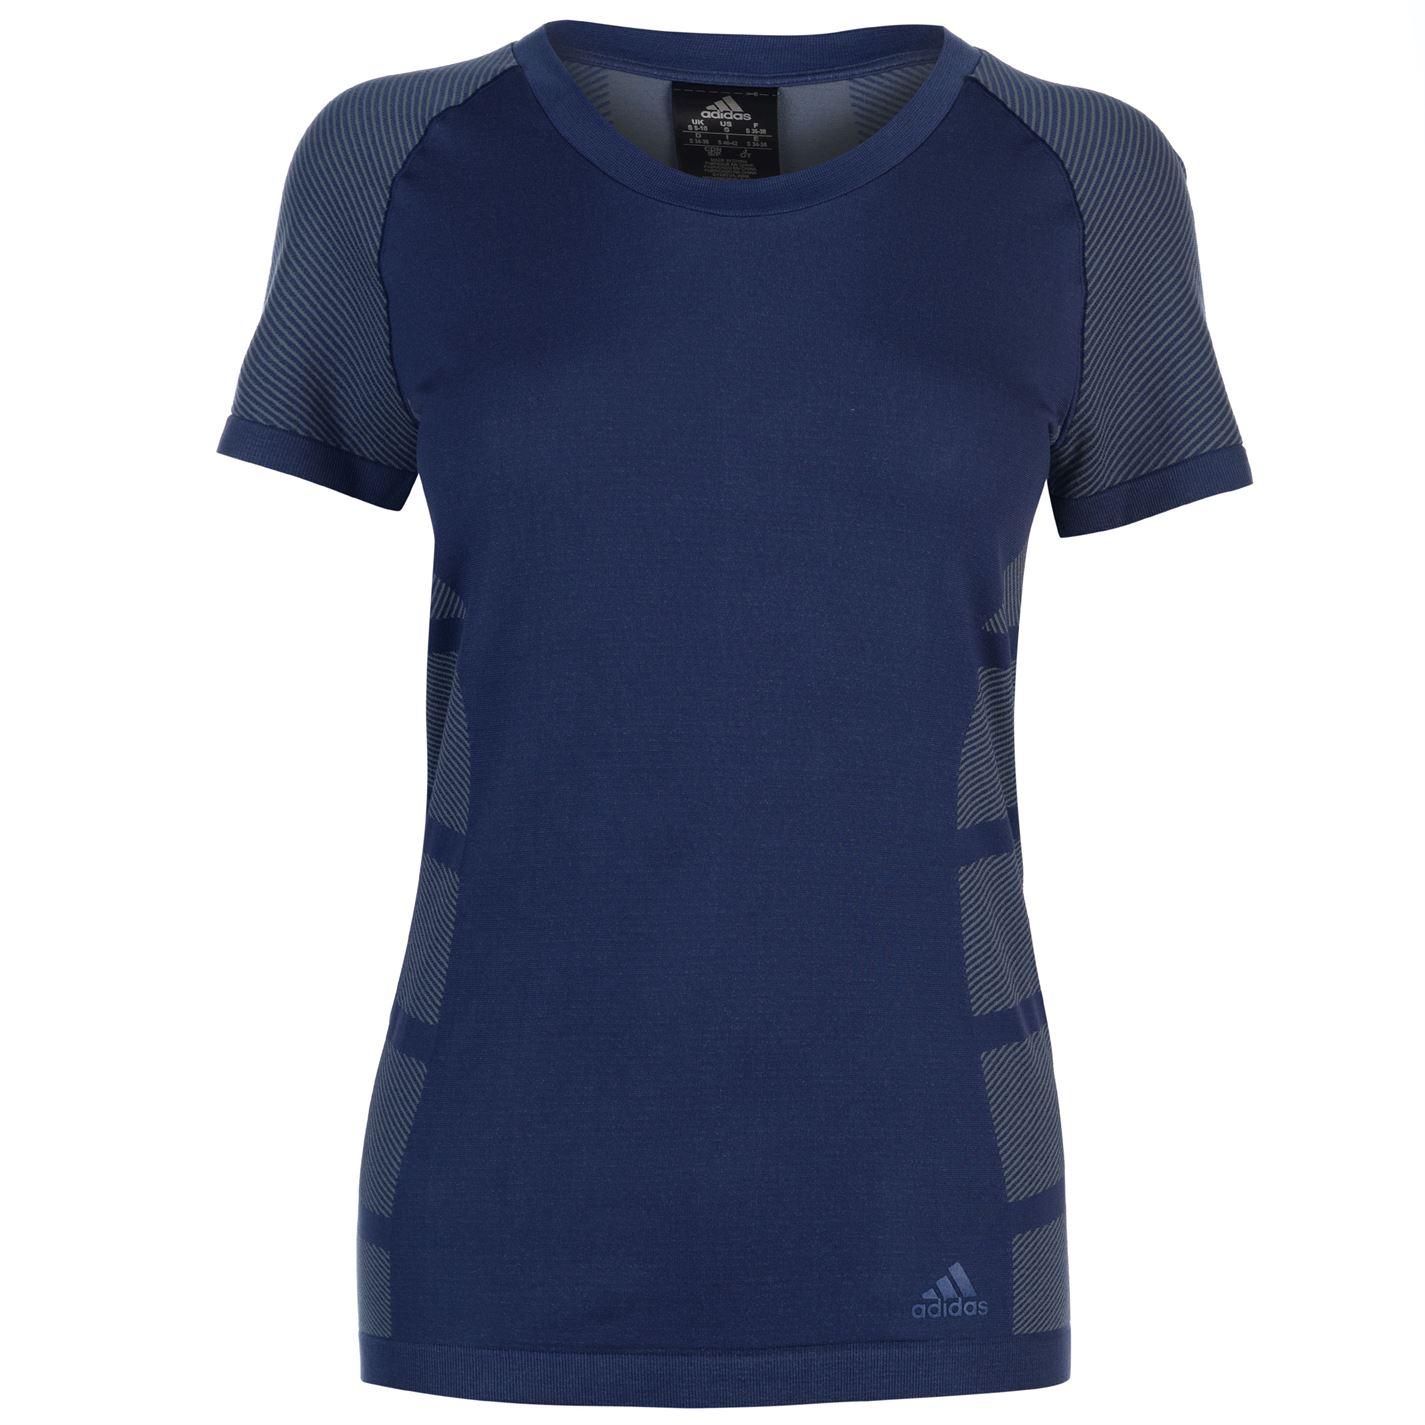 Adidas Ultra T Shirt Ladies